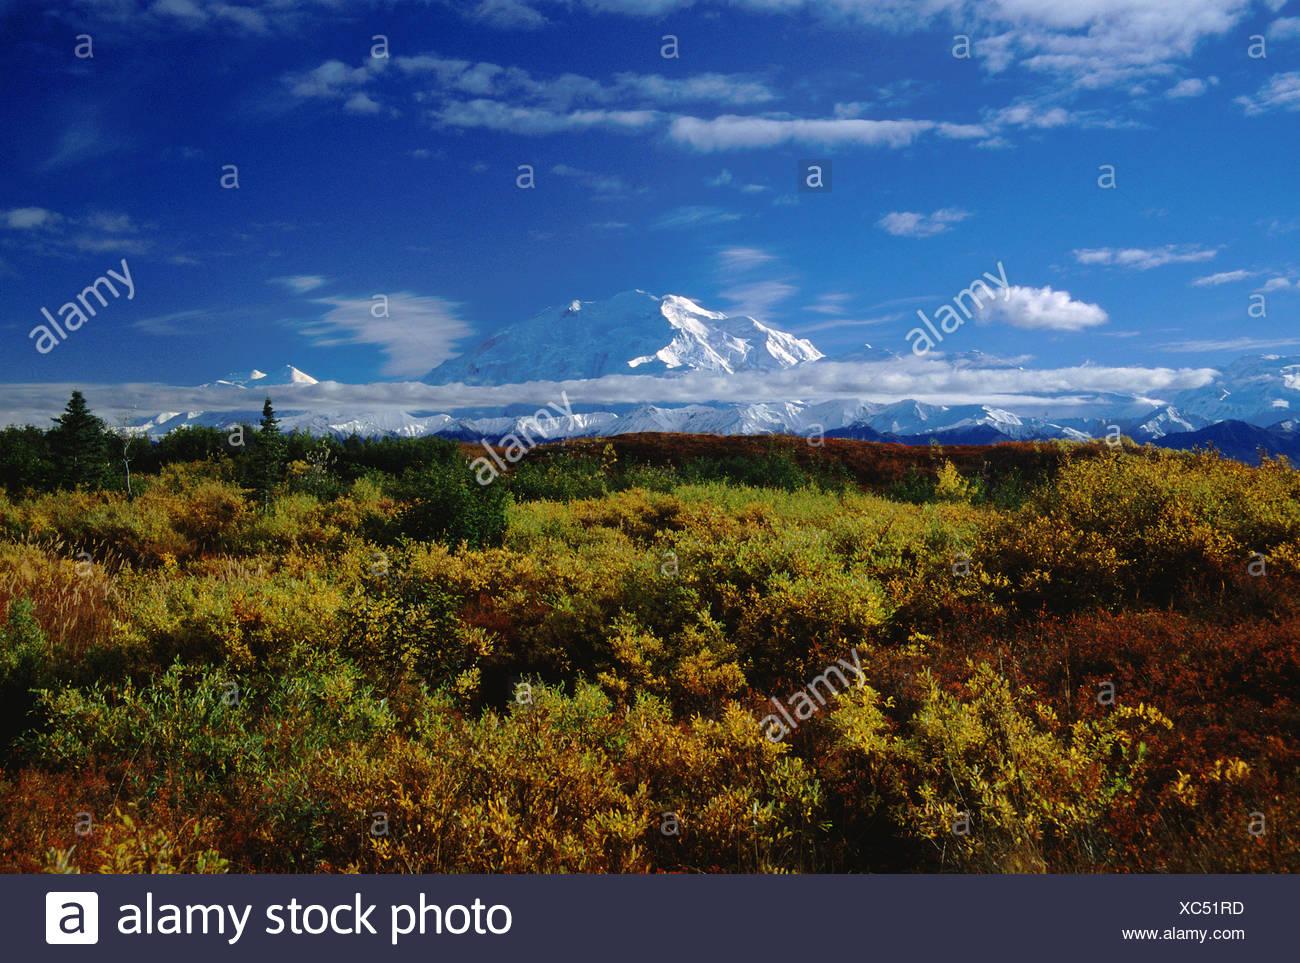 Alaska alaska rank mountains blue stock photos alaska alaska rank